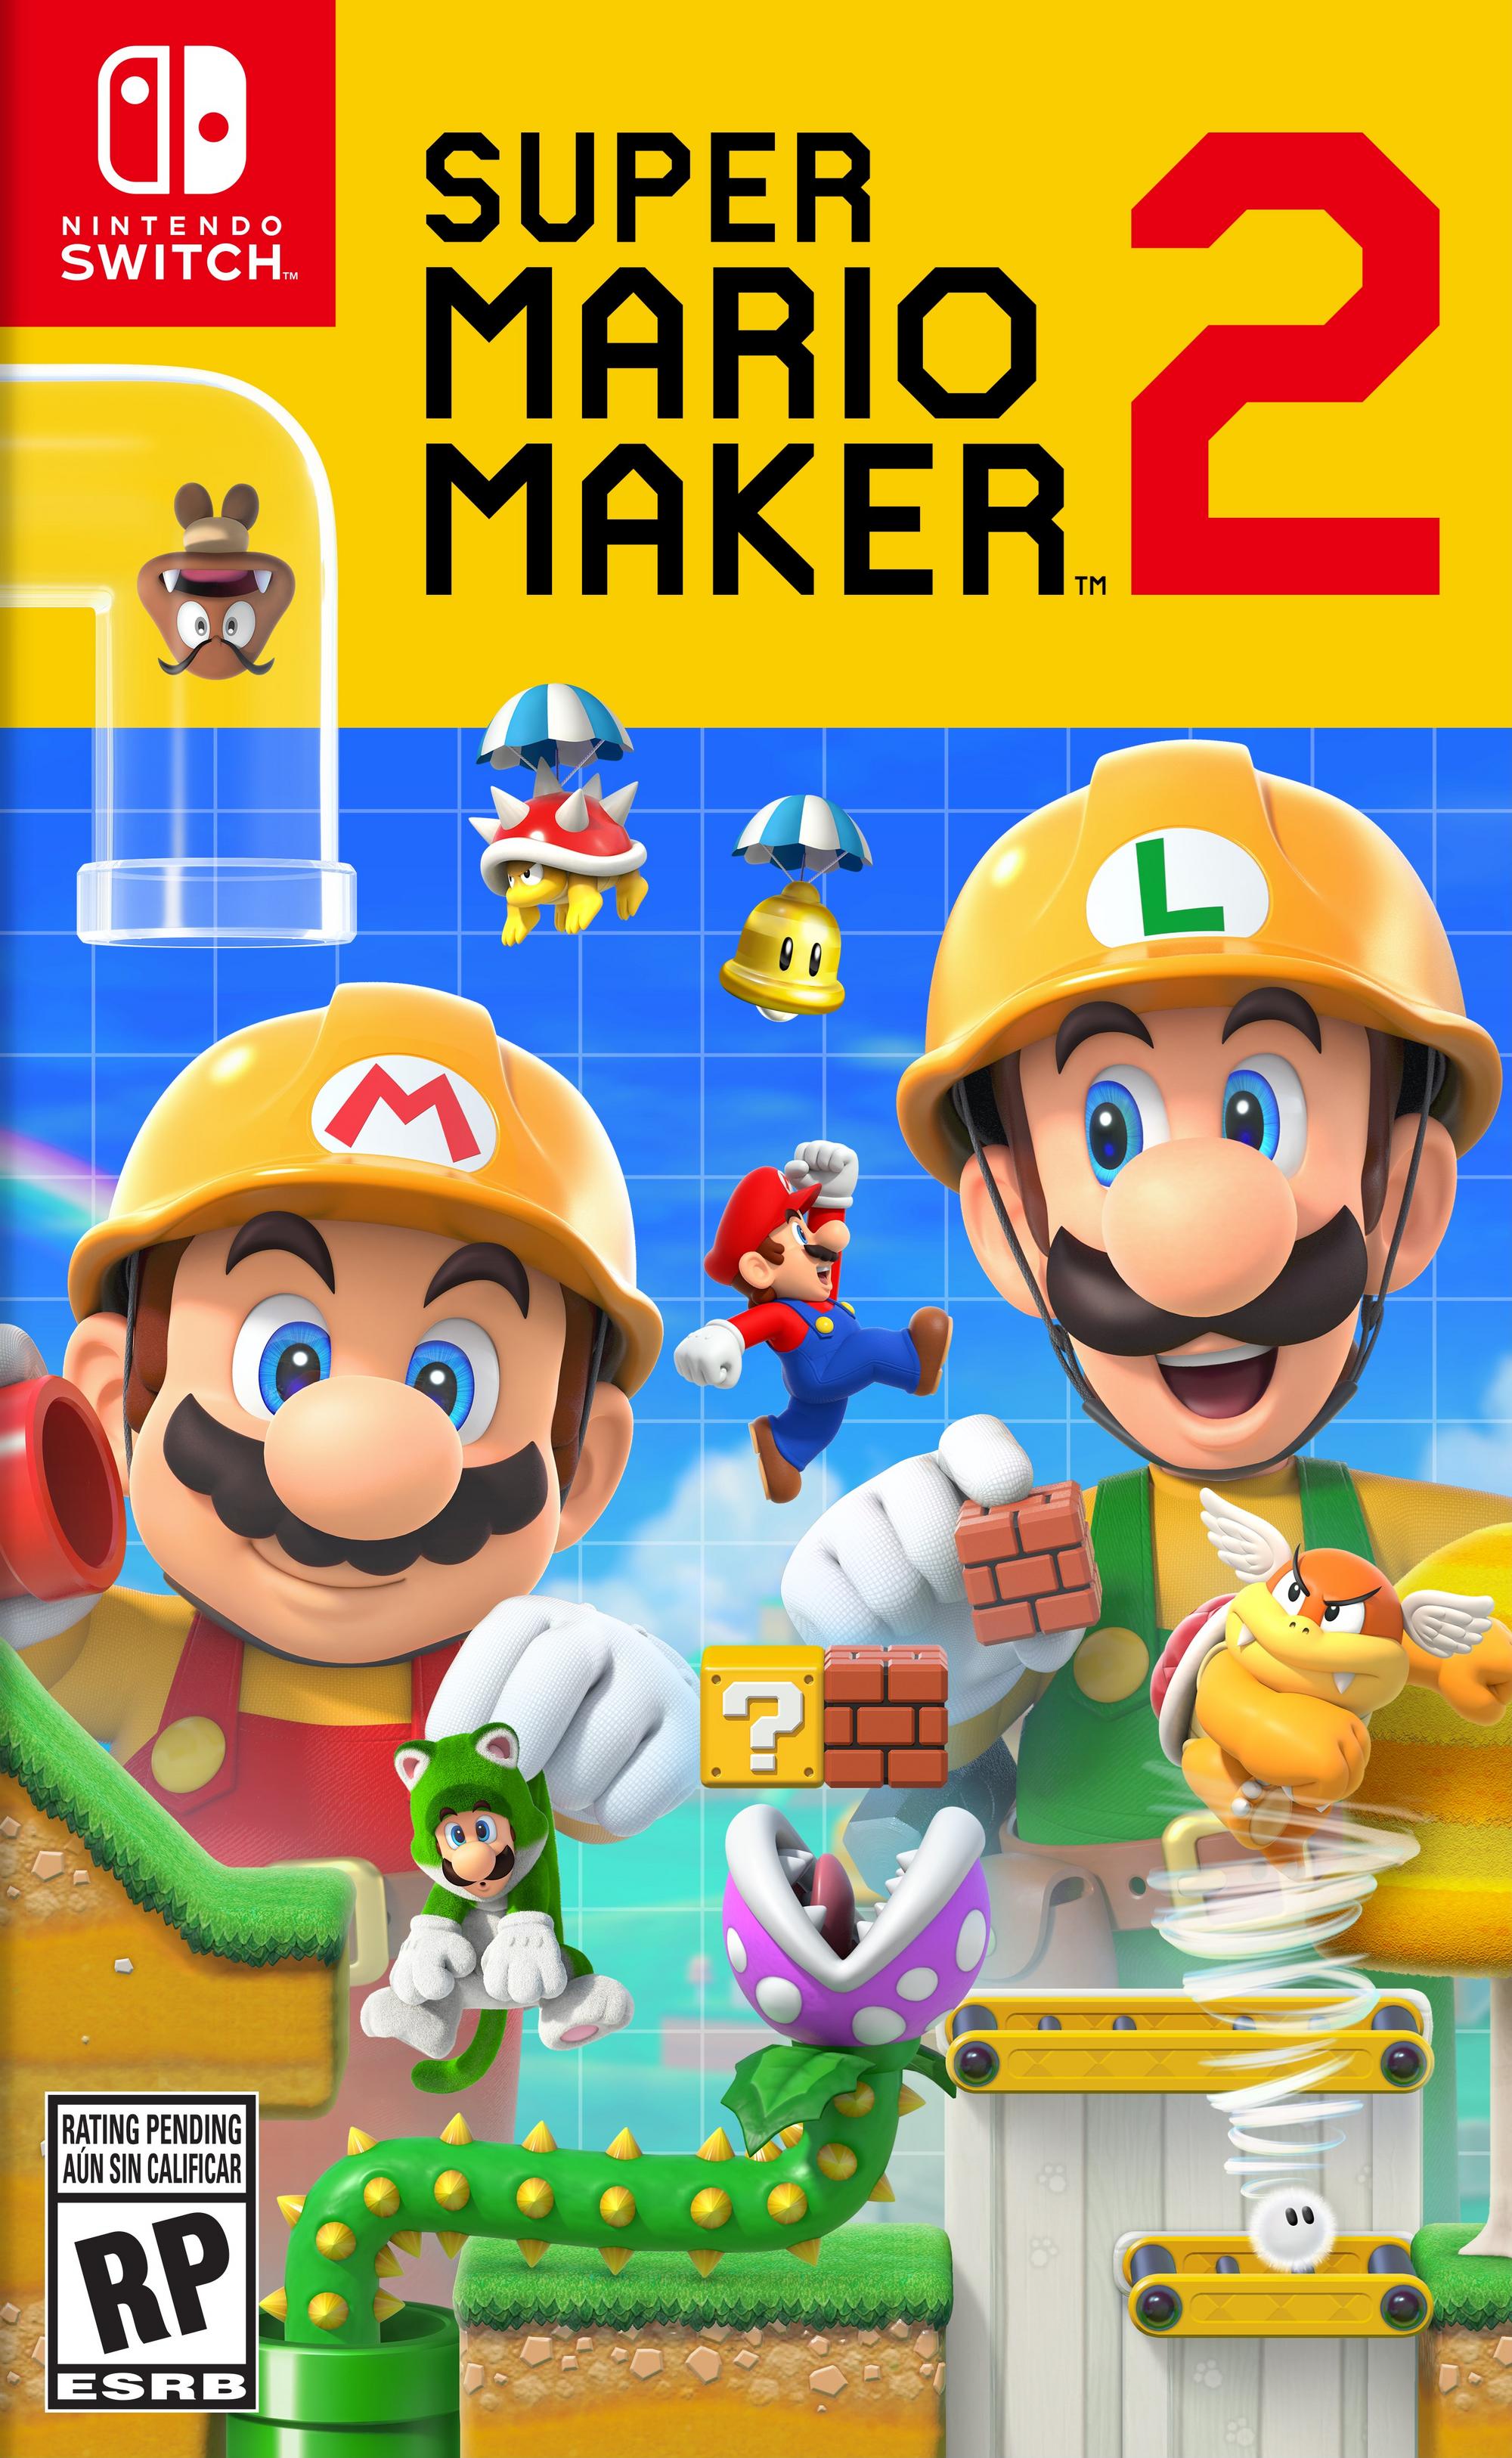 Super Mario Maker 2 | Kaizo Mario Maker Wikia | FANDOM